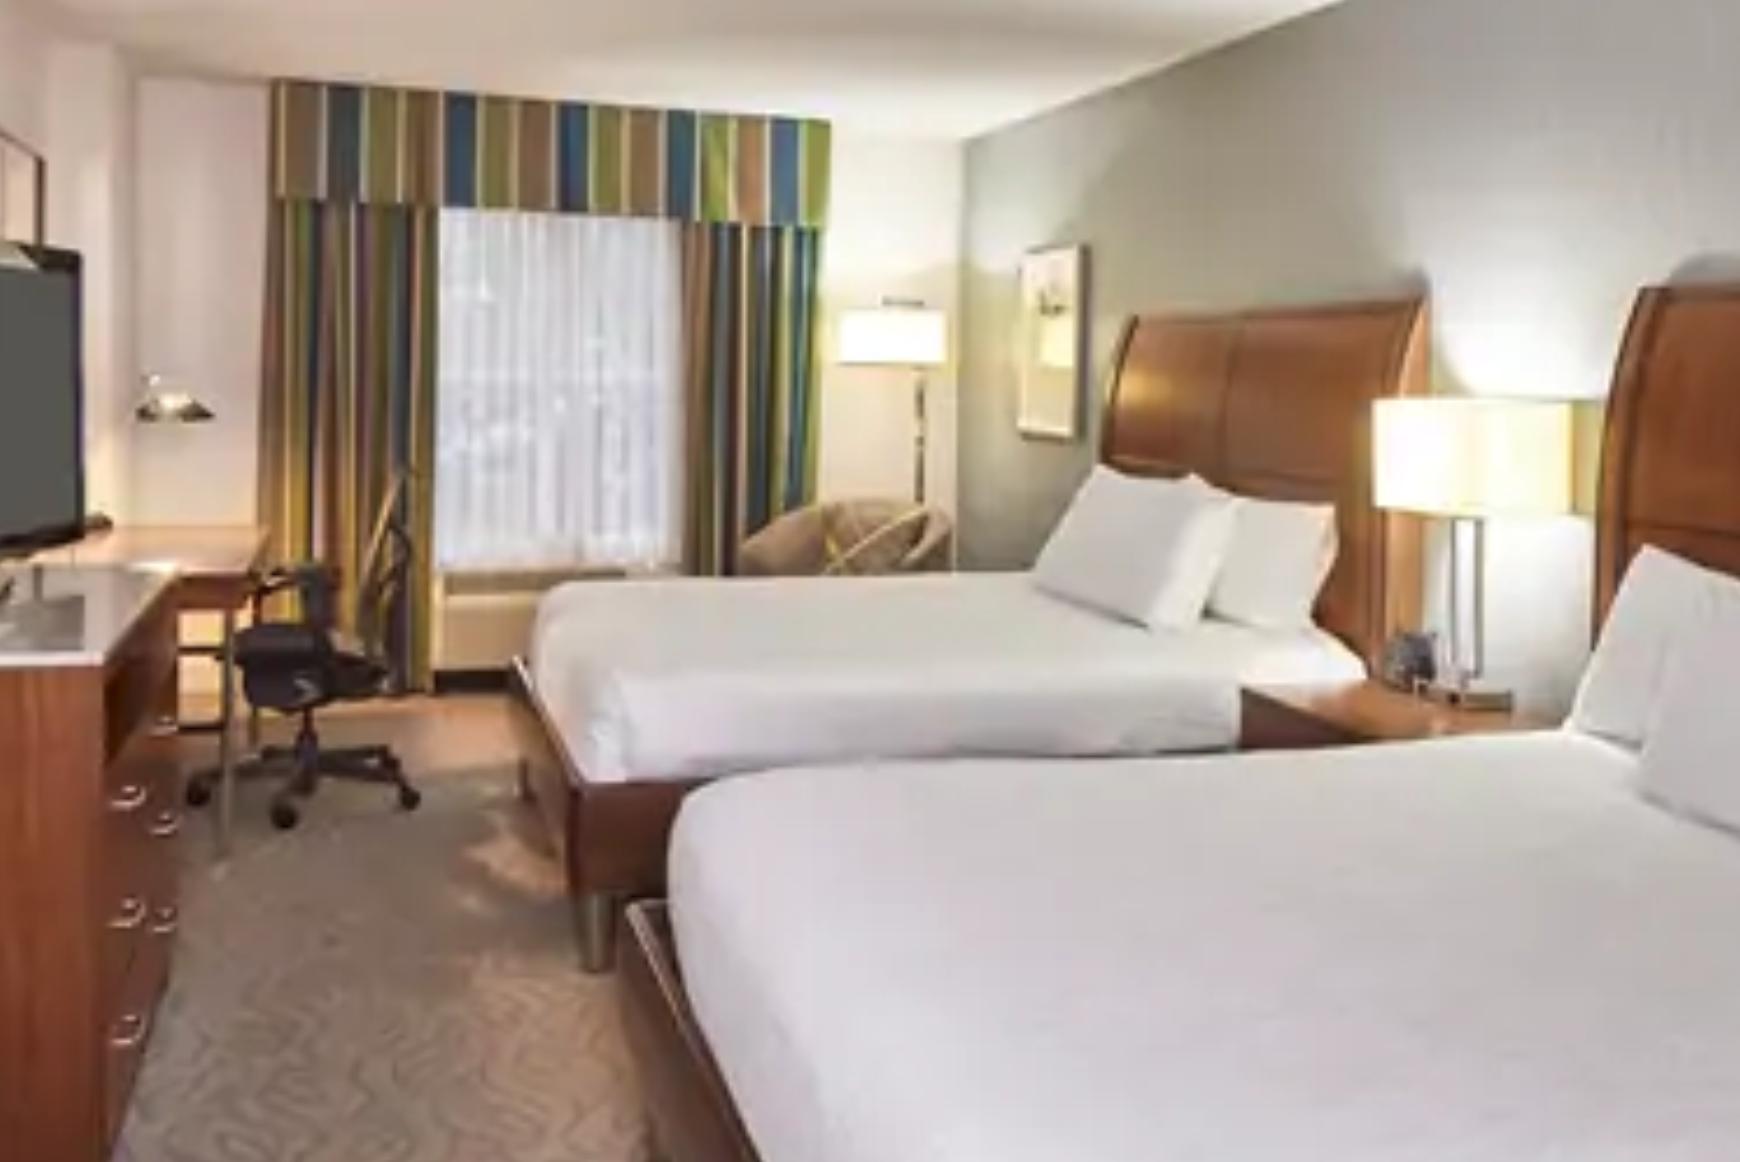 https://www.hotelsbyday.com/_data/default-hotel_image/4/20507/screenshot-2020-08-13-at-1-55-44-pm.png